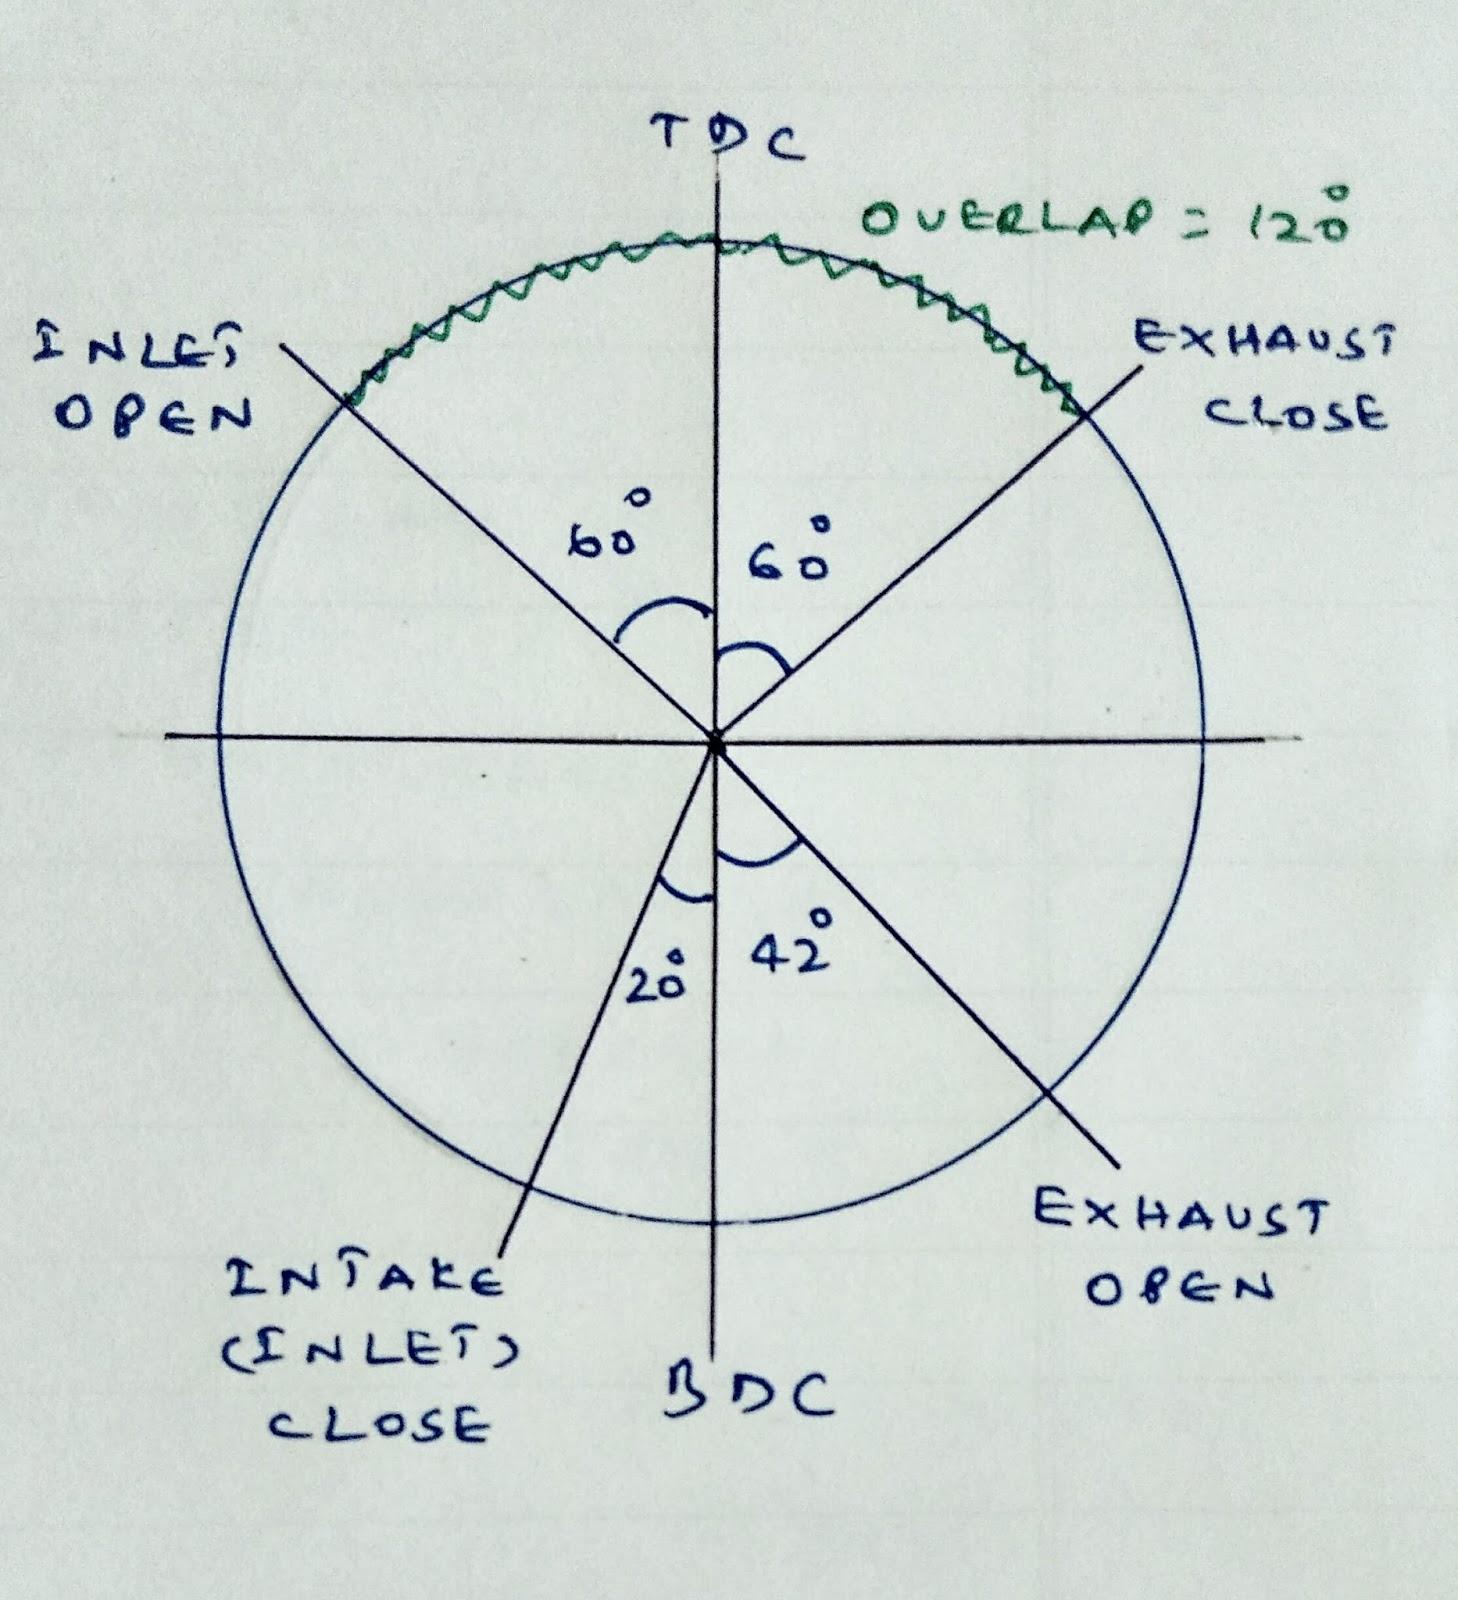 Valve Timing Diagram For 4 Stroke Diesel Engine 97 F150 Wiring Camshaft Chain